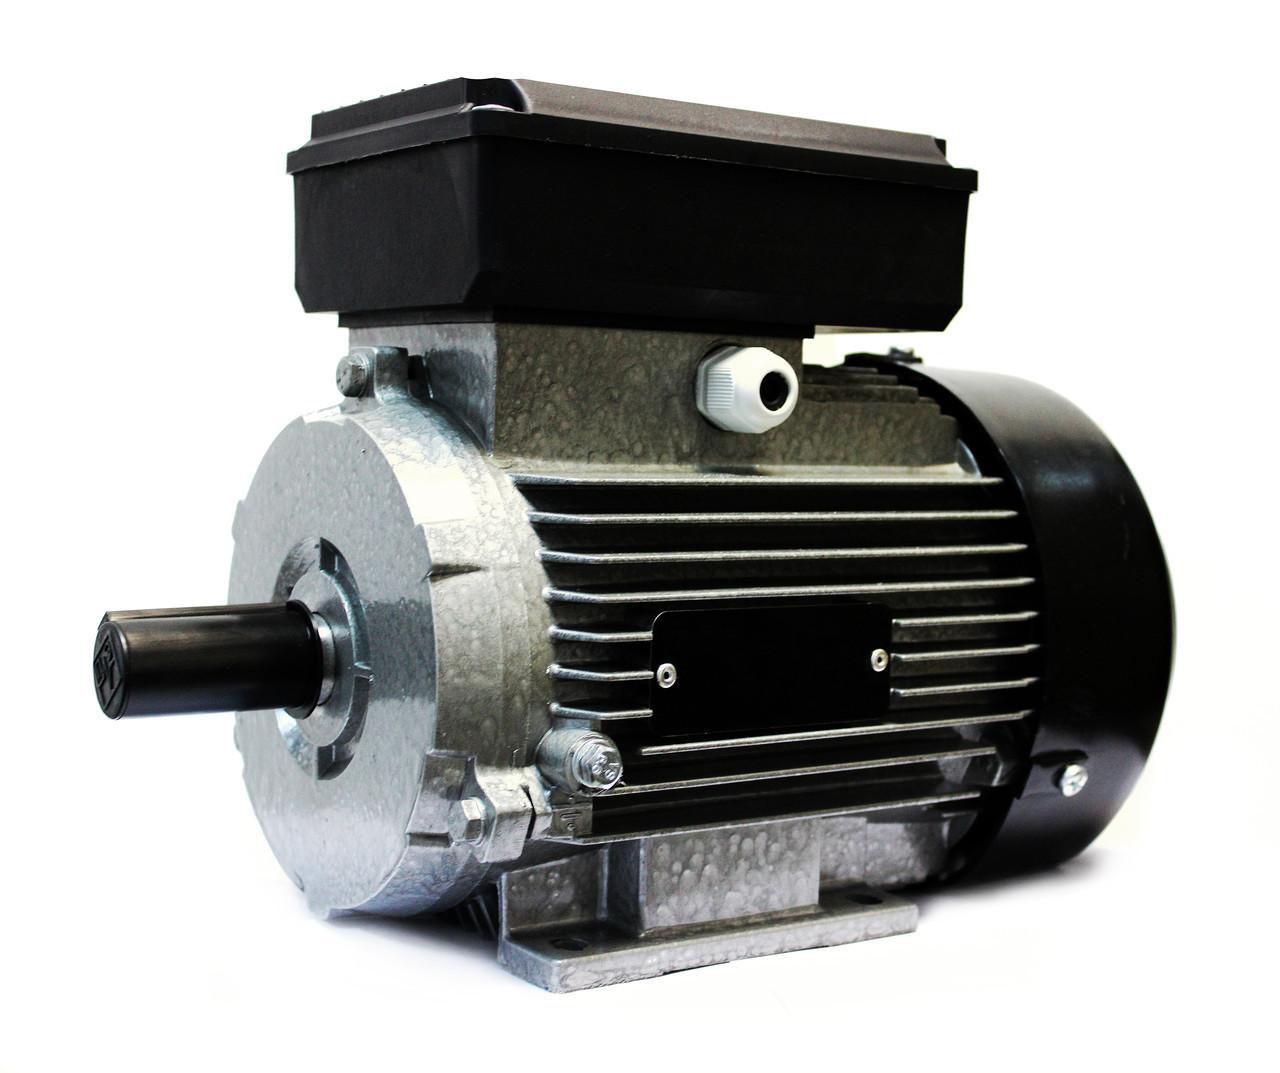 Асинхронний однофазний електродвигун АИ1Е 80 В2 У2(Л)